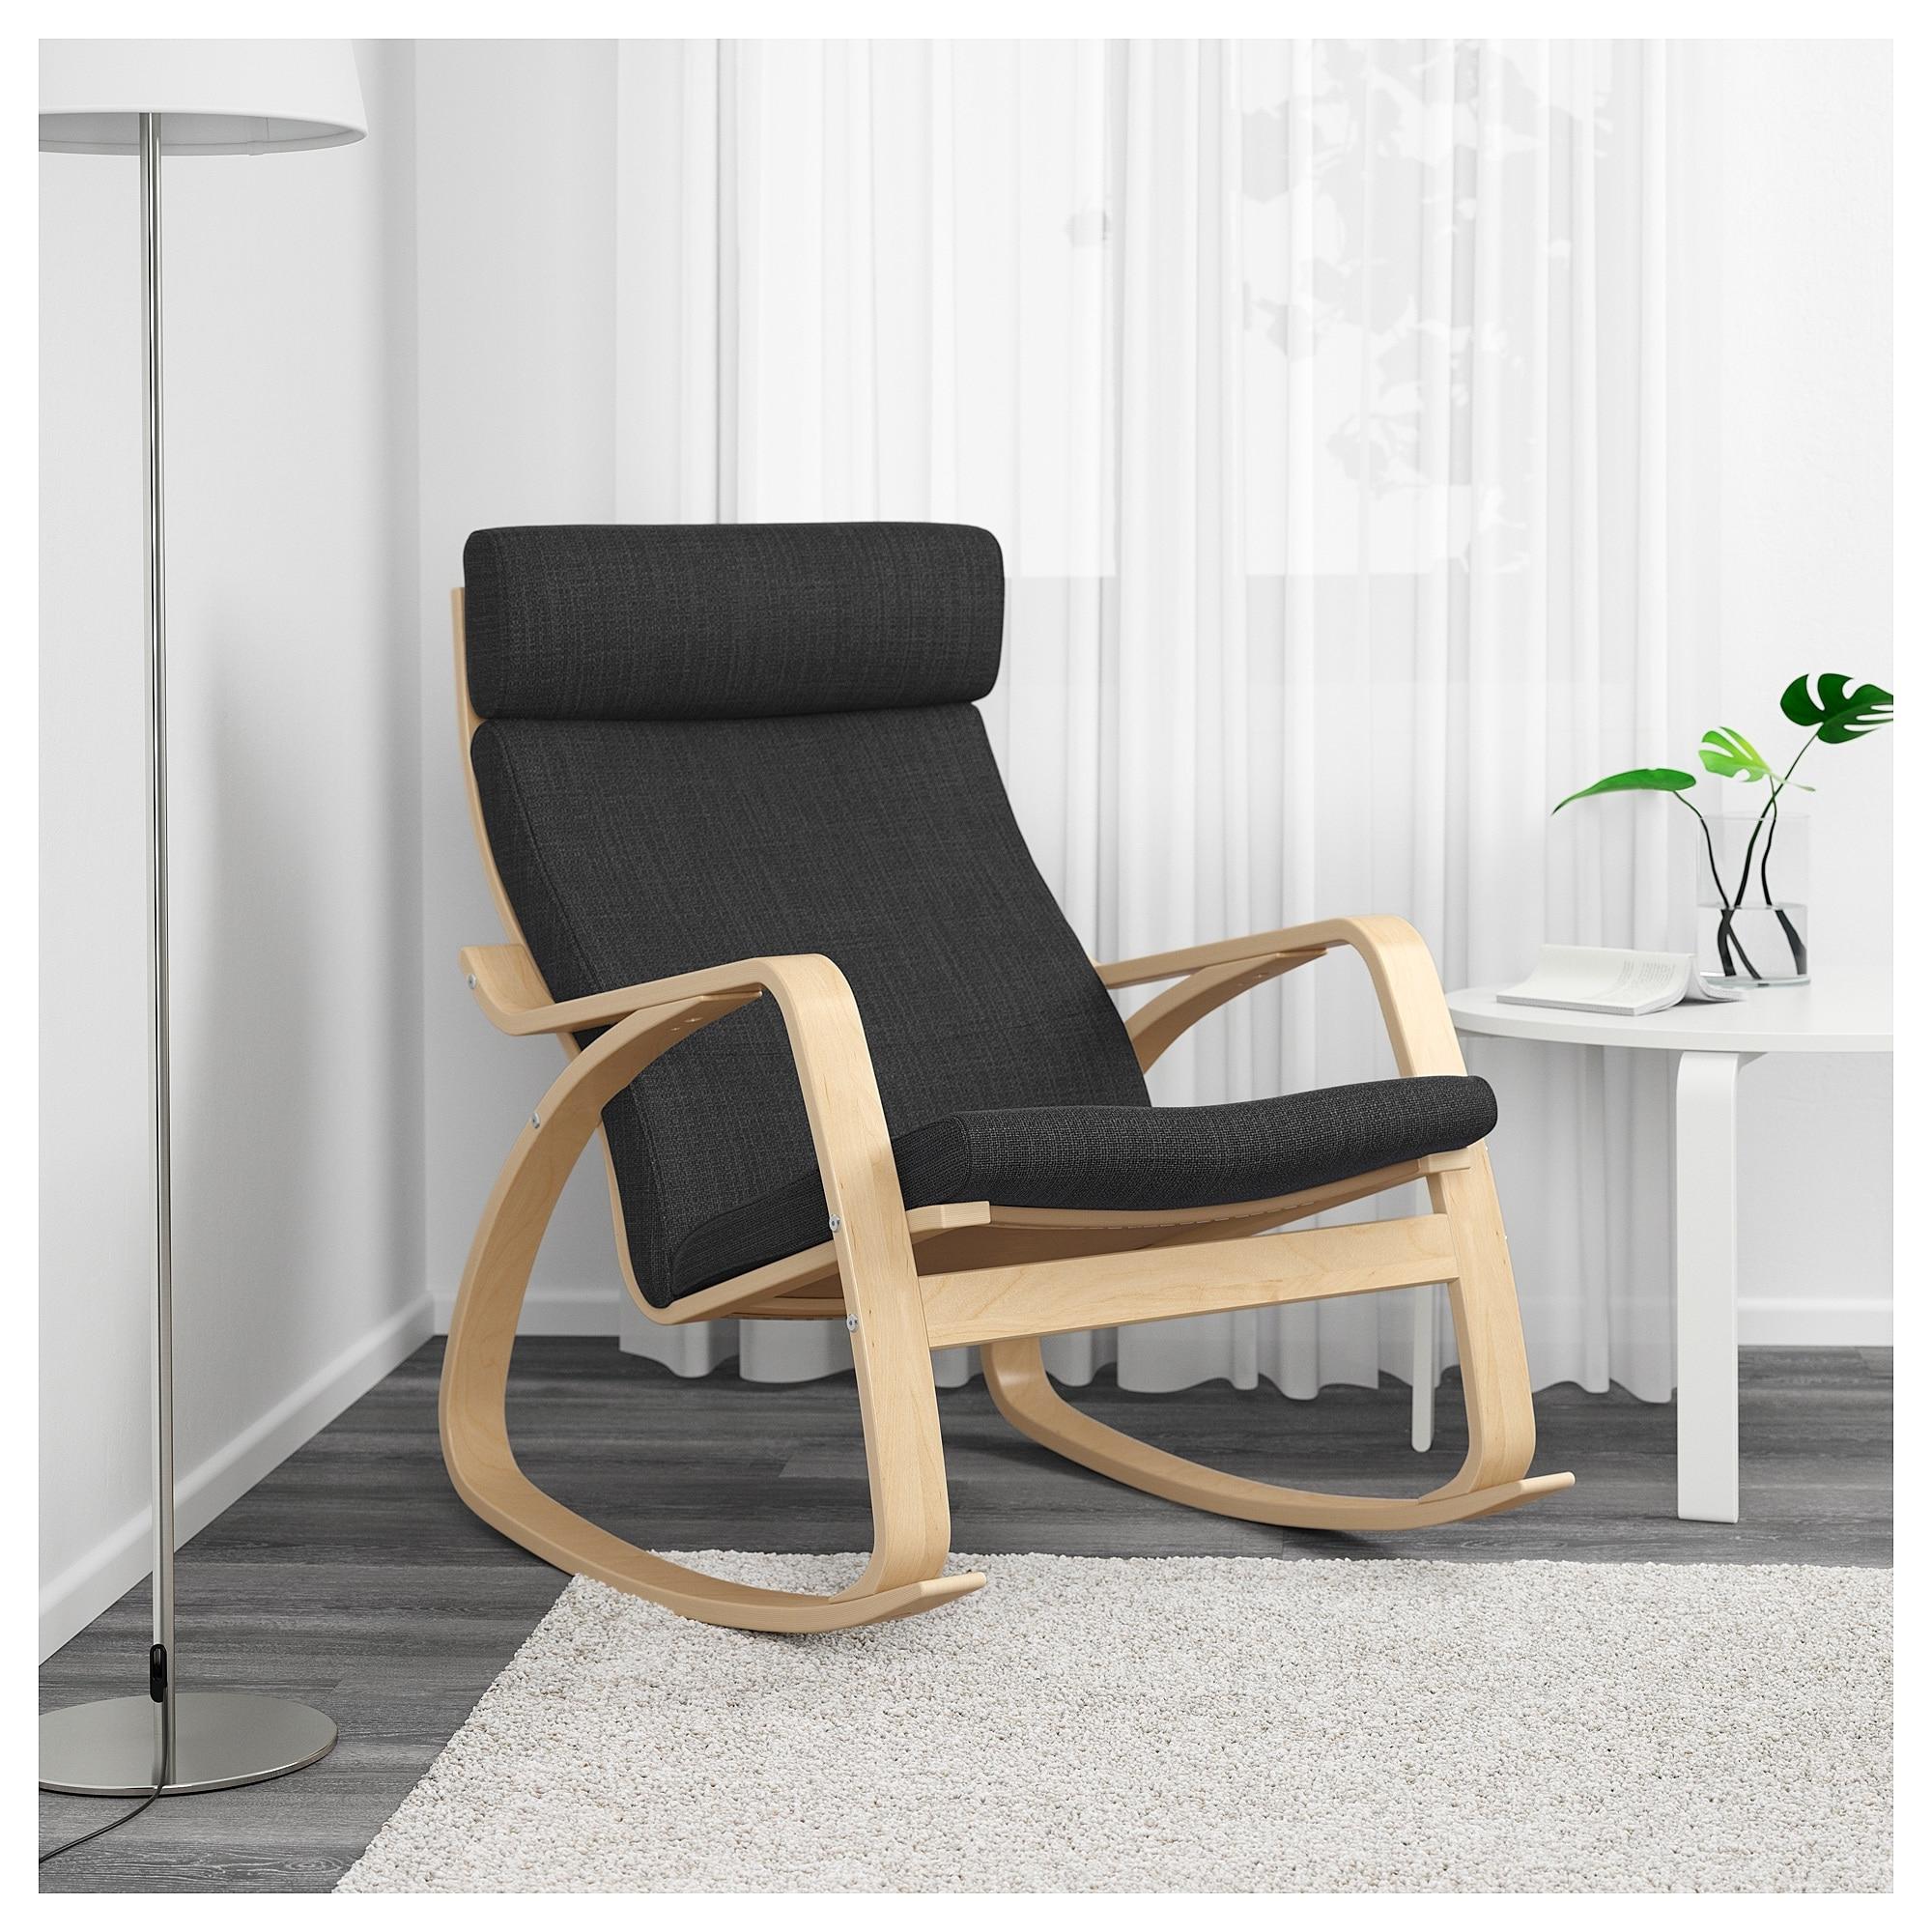 Rocking Chairs At Ikea Regarding 2019 Poäng Rocking Chair Birch Veneer/hillared Anthracite – Ikea (View 7 of 20)